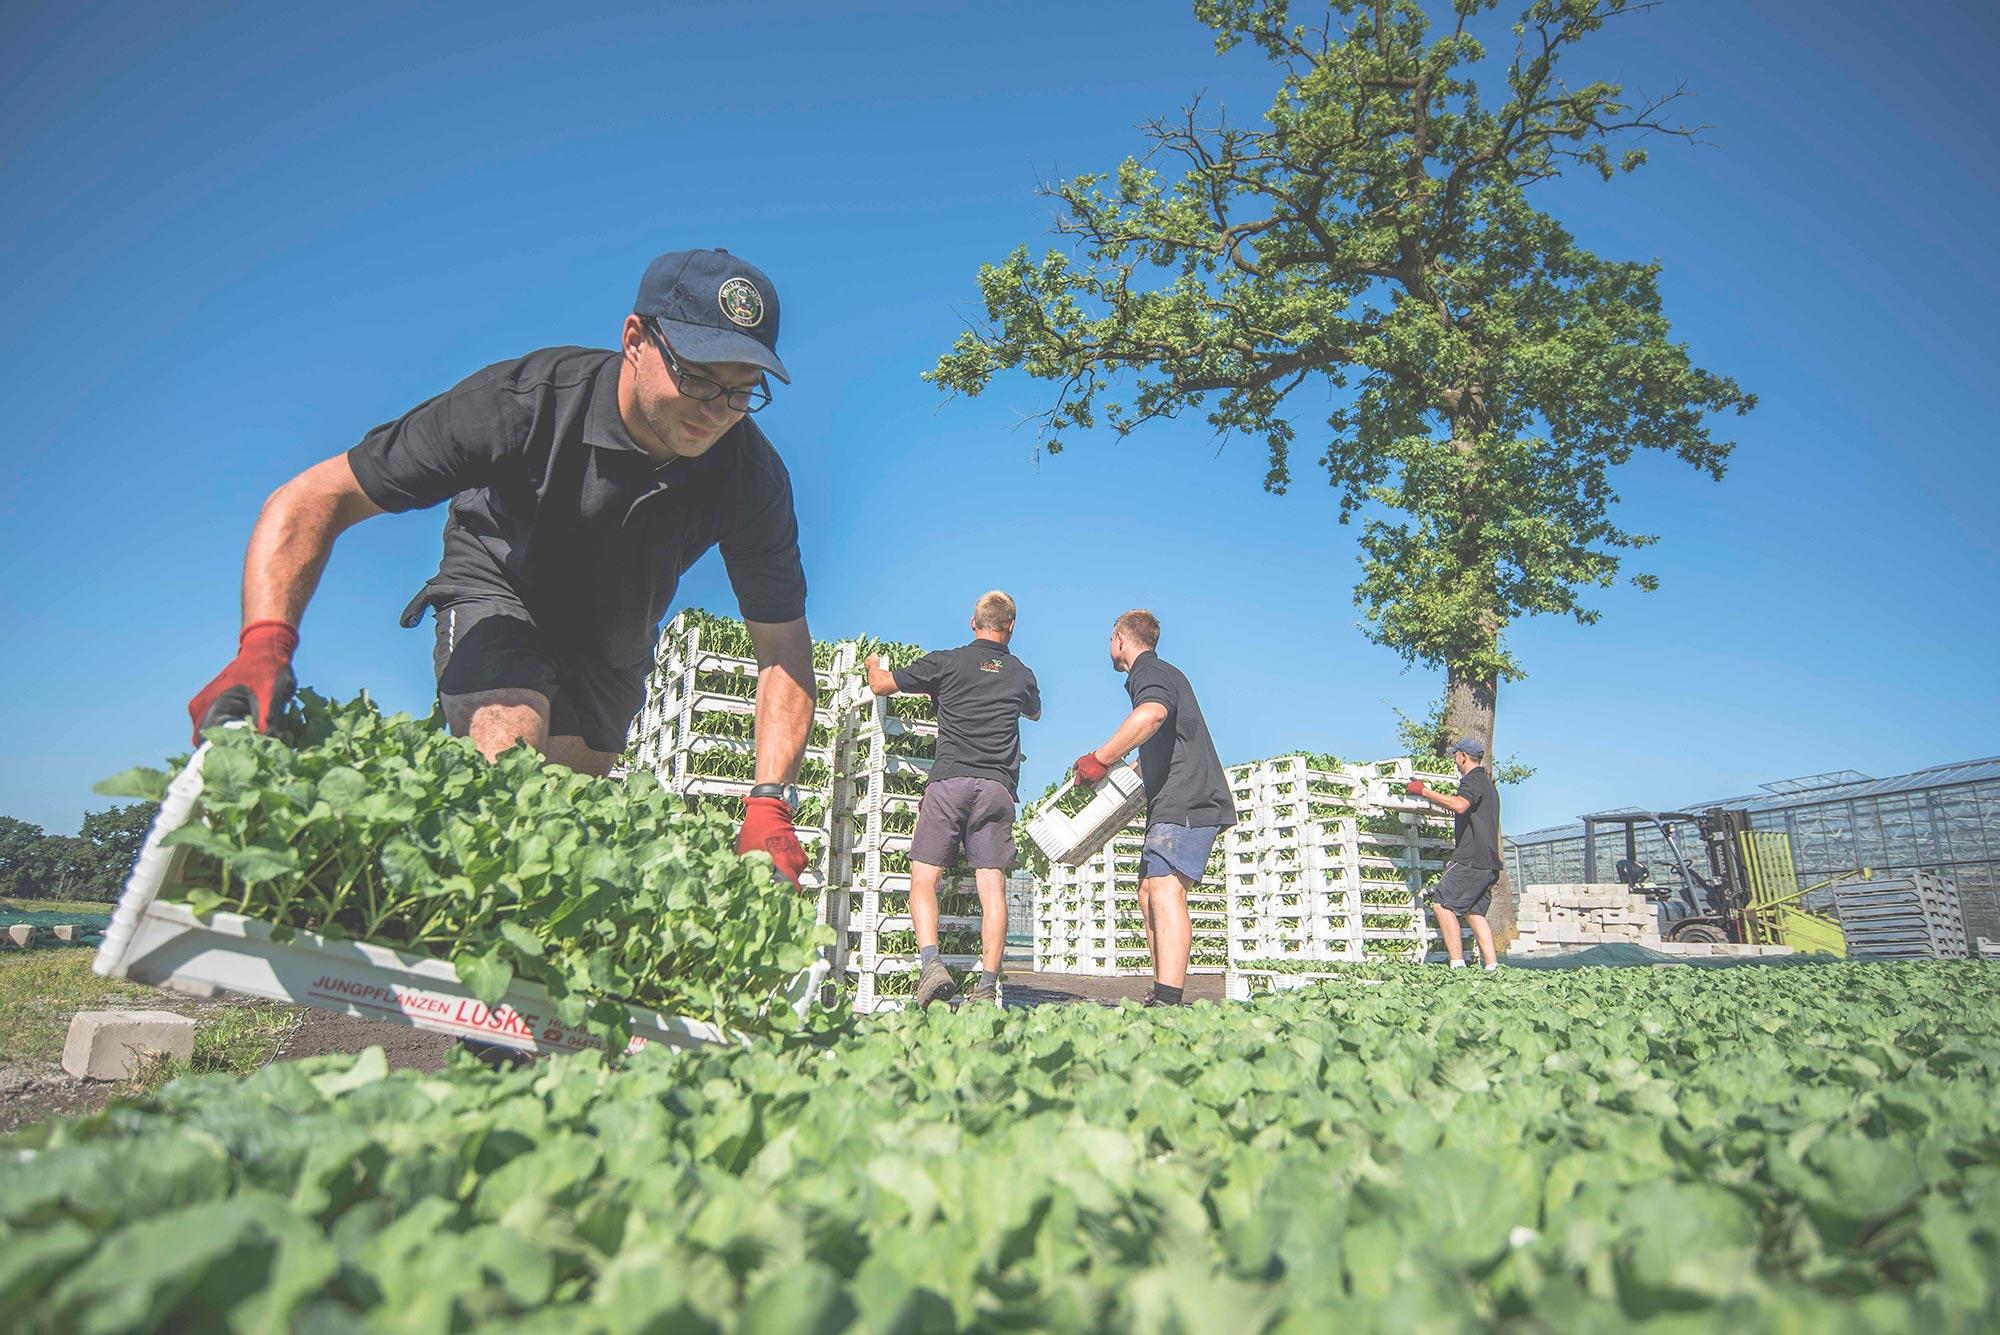 Lüske Jungpflanzen - Feldarbeit